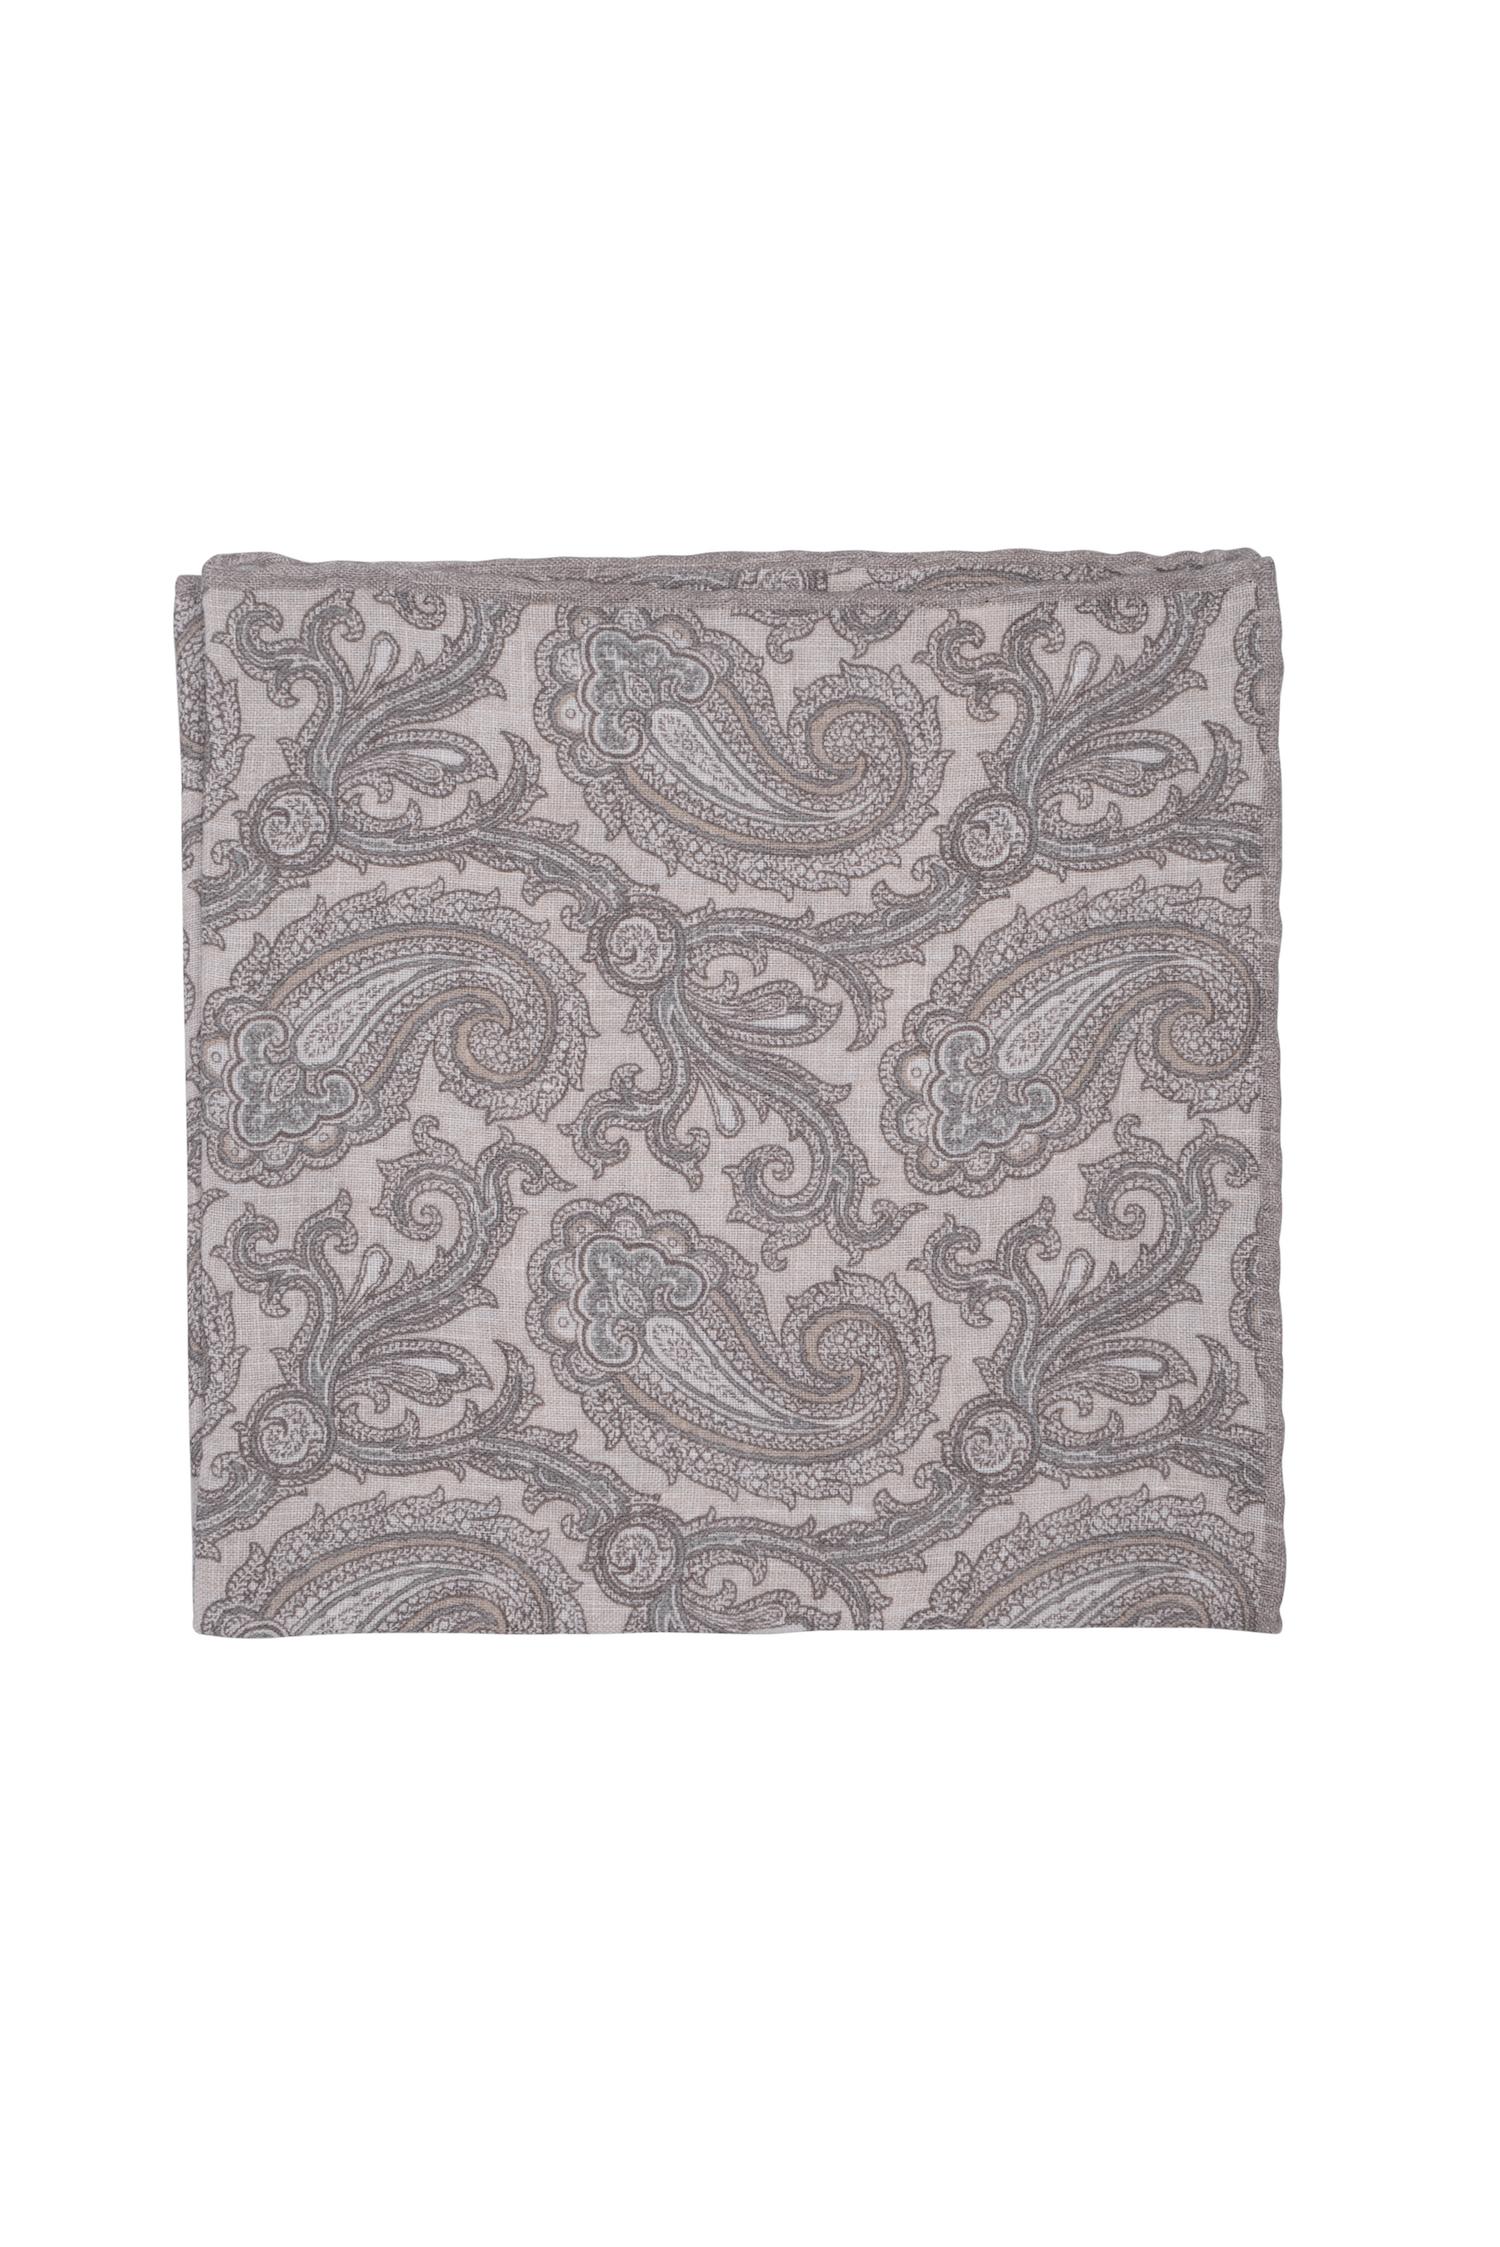 Pochette motifs paisley en lin – beige   Cadot a768bbce7f3